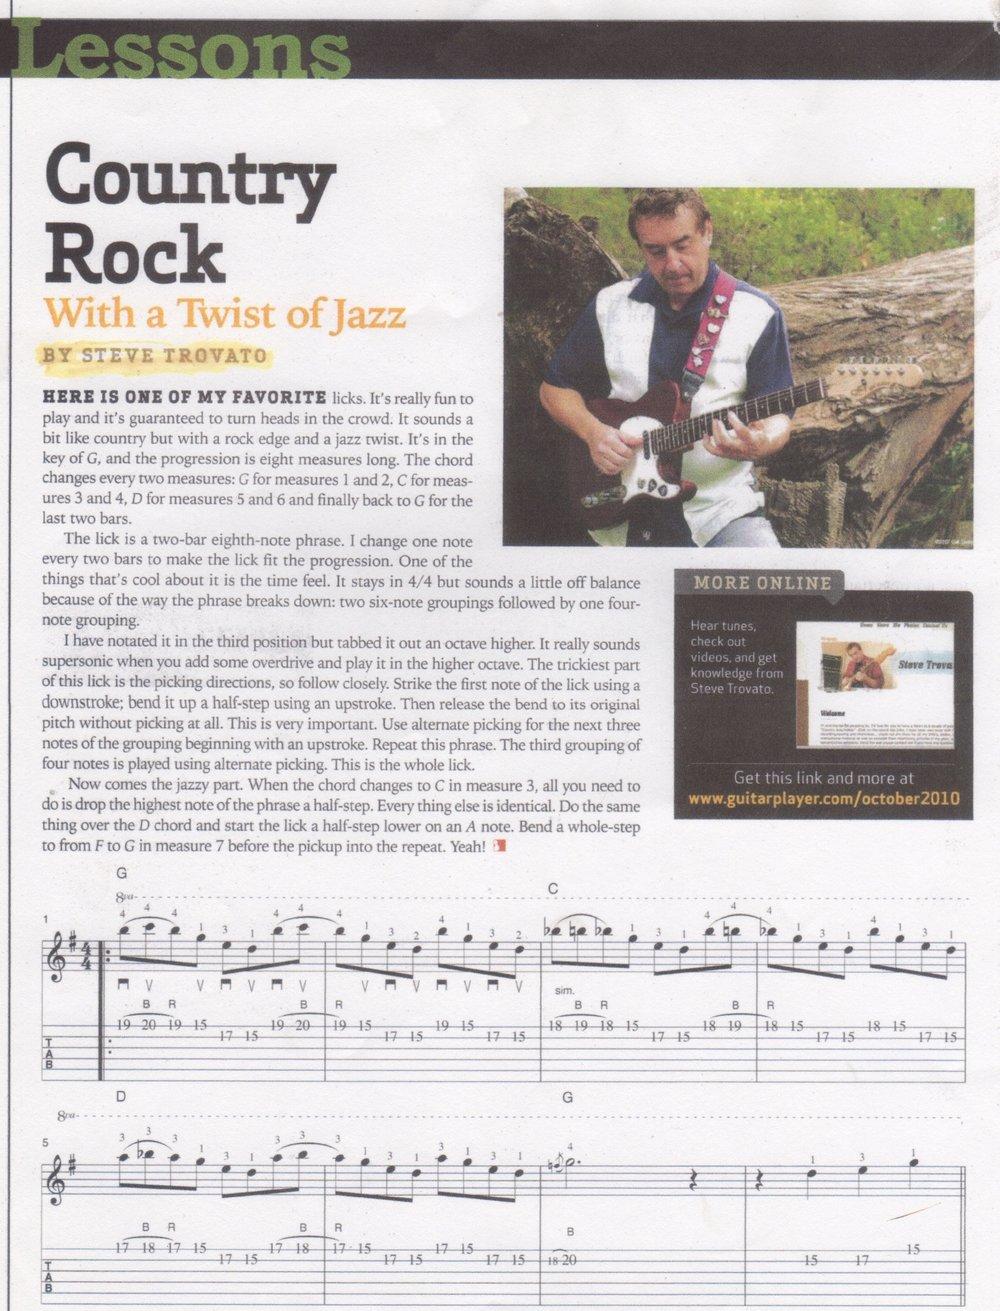 2010_Oct Guitarplayer.com - Country Rock.jpeg